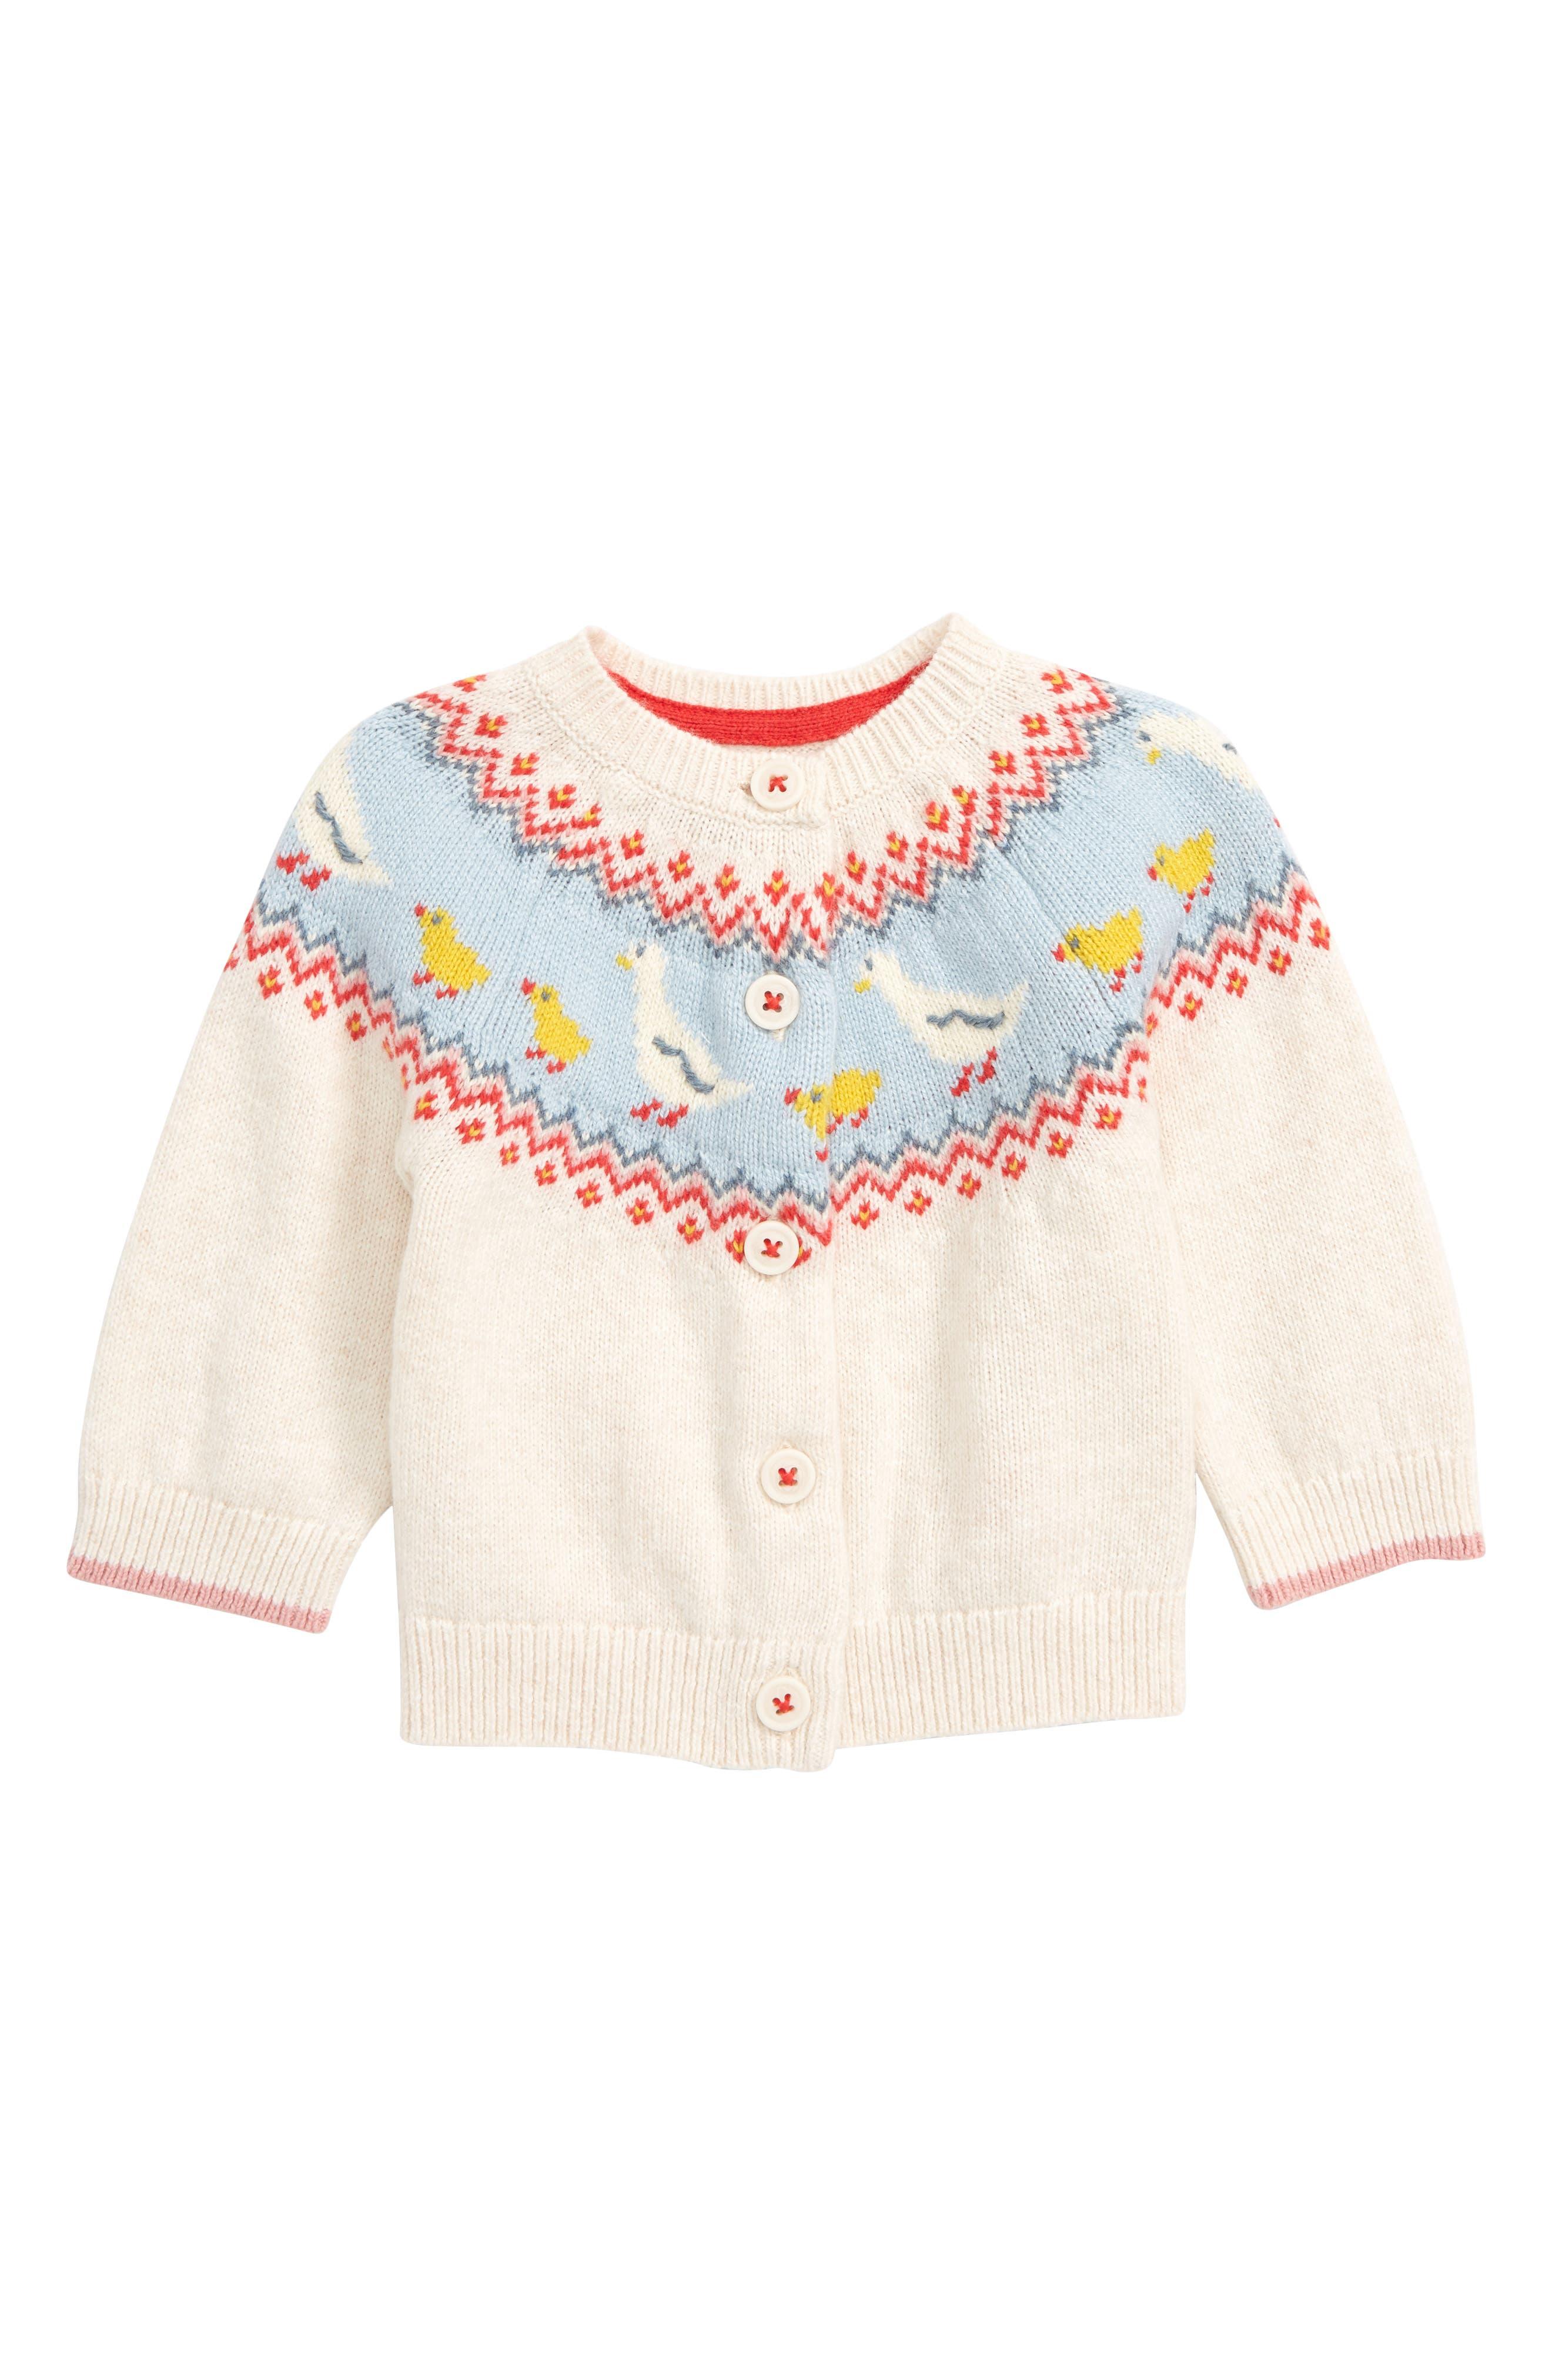 Toddler Girls Mini Boden Fun Cardigan Size 34Y  Ivory